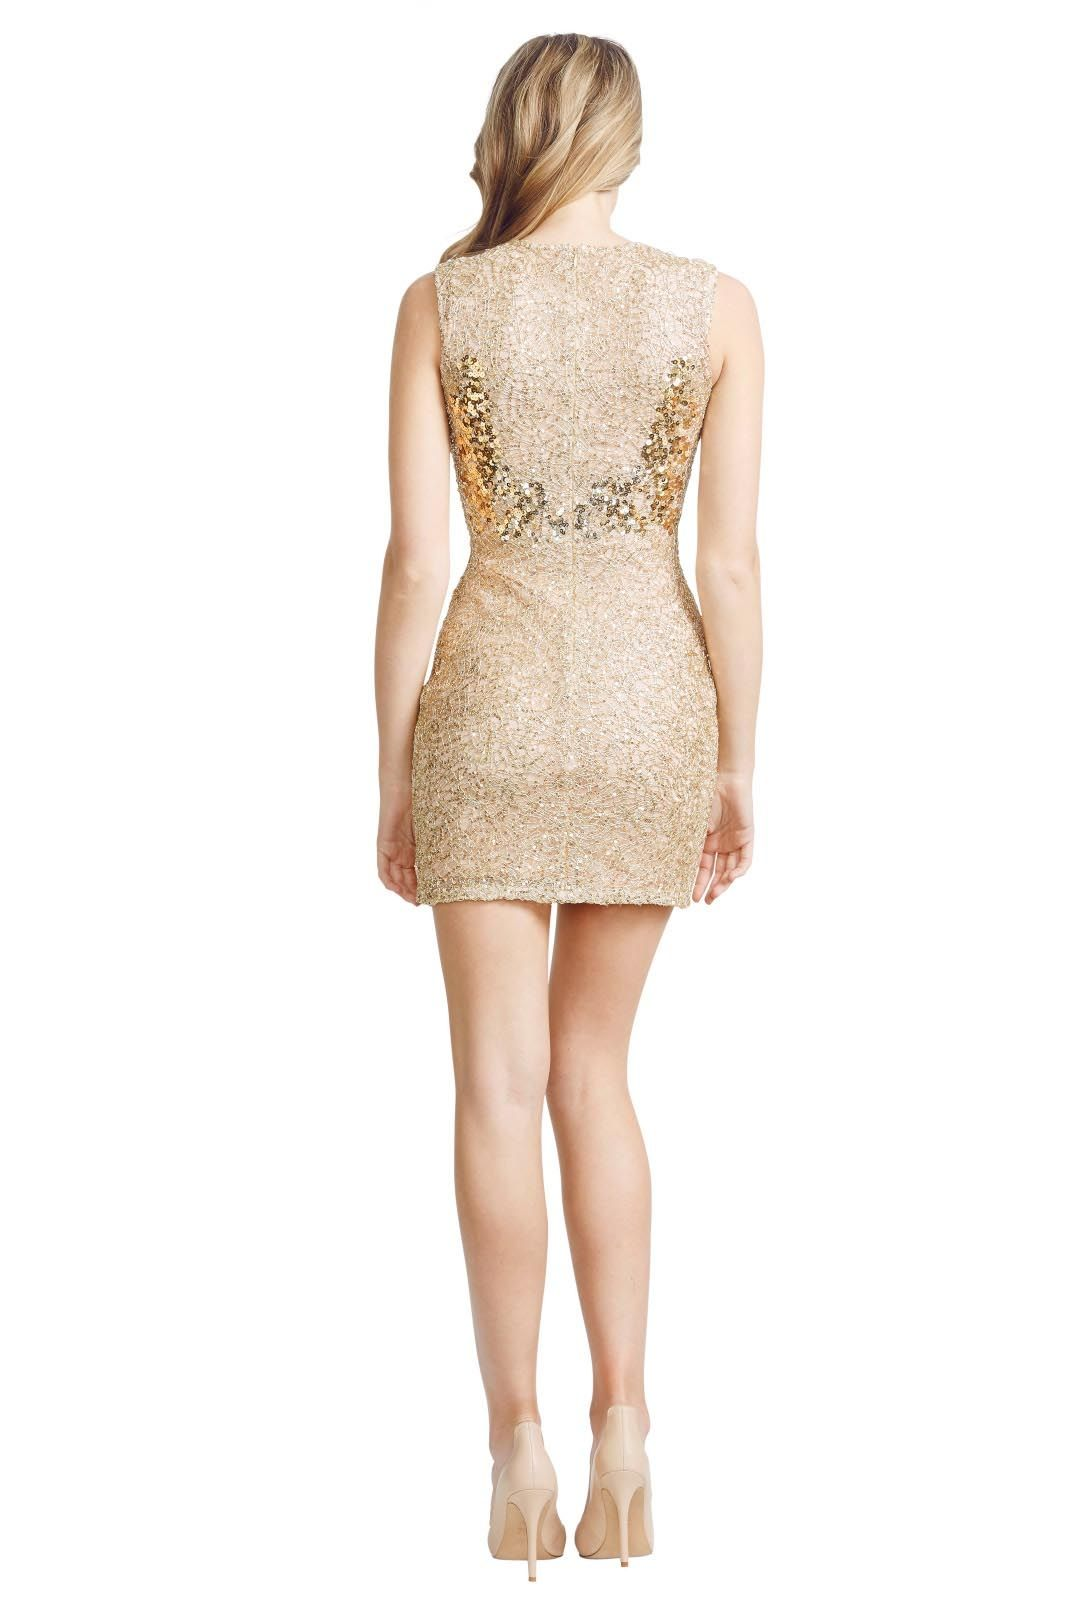 Alex Perry - Gilda Dress - Gold - Back